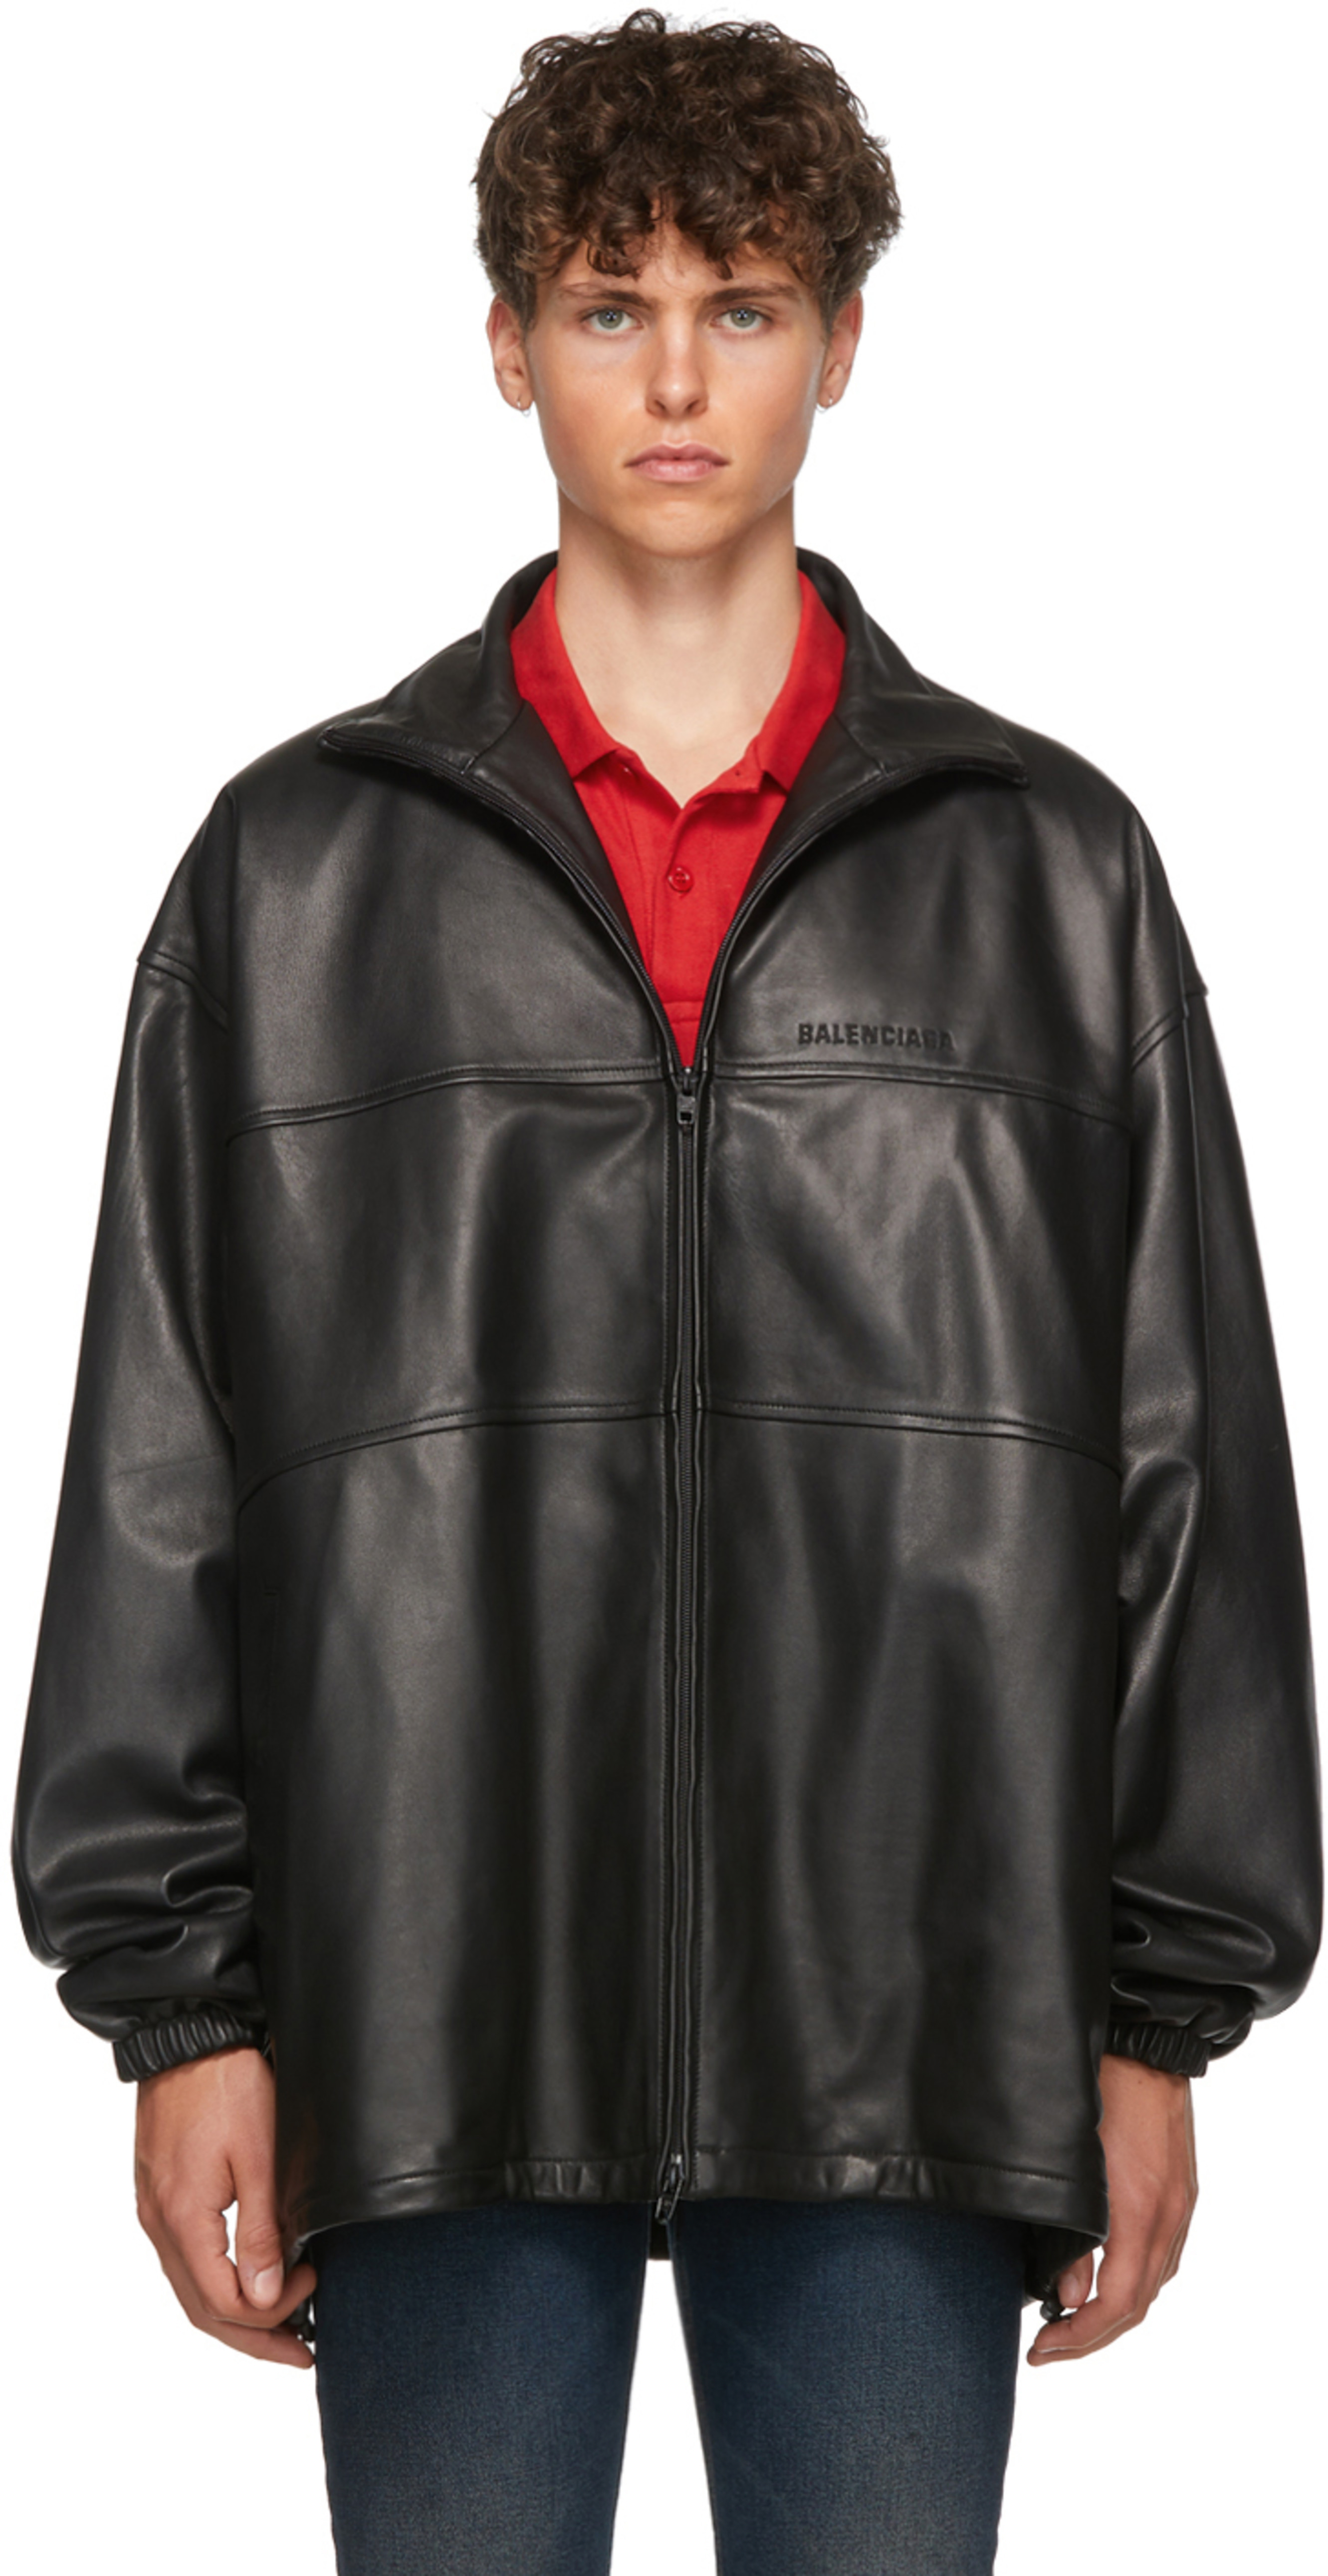 62babc280e79d Black Leather Zip-Up Track Jacket